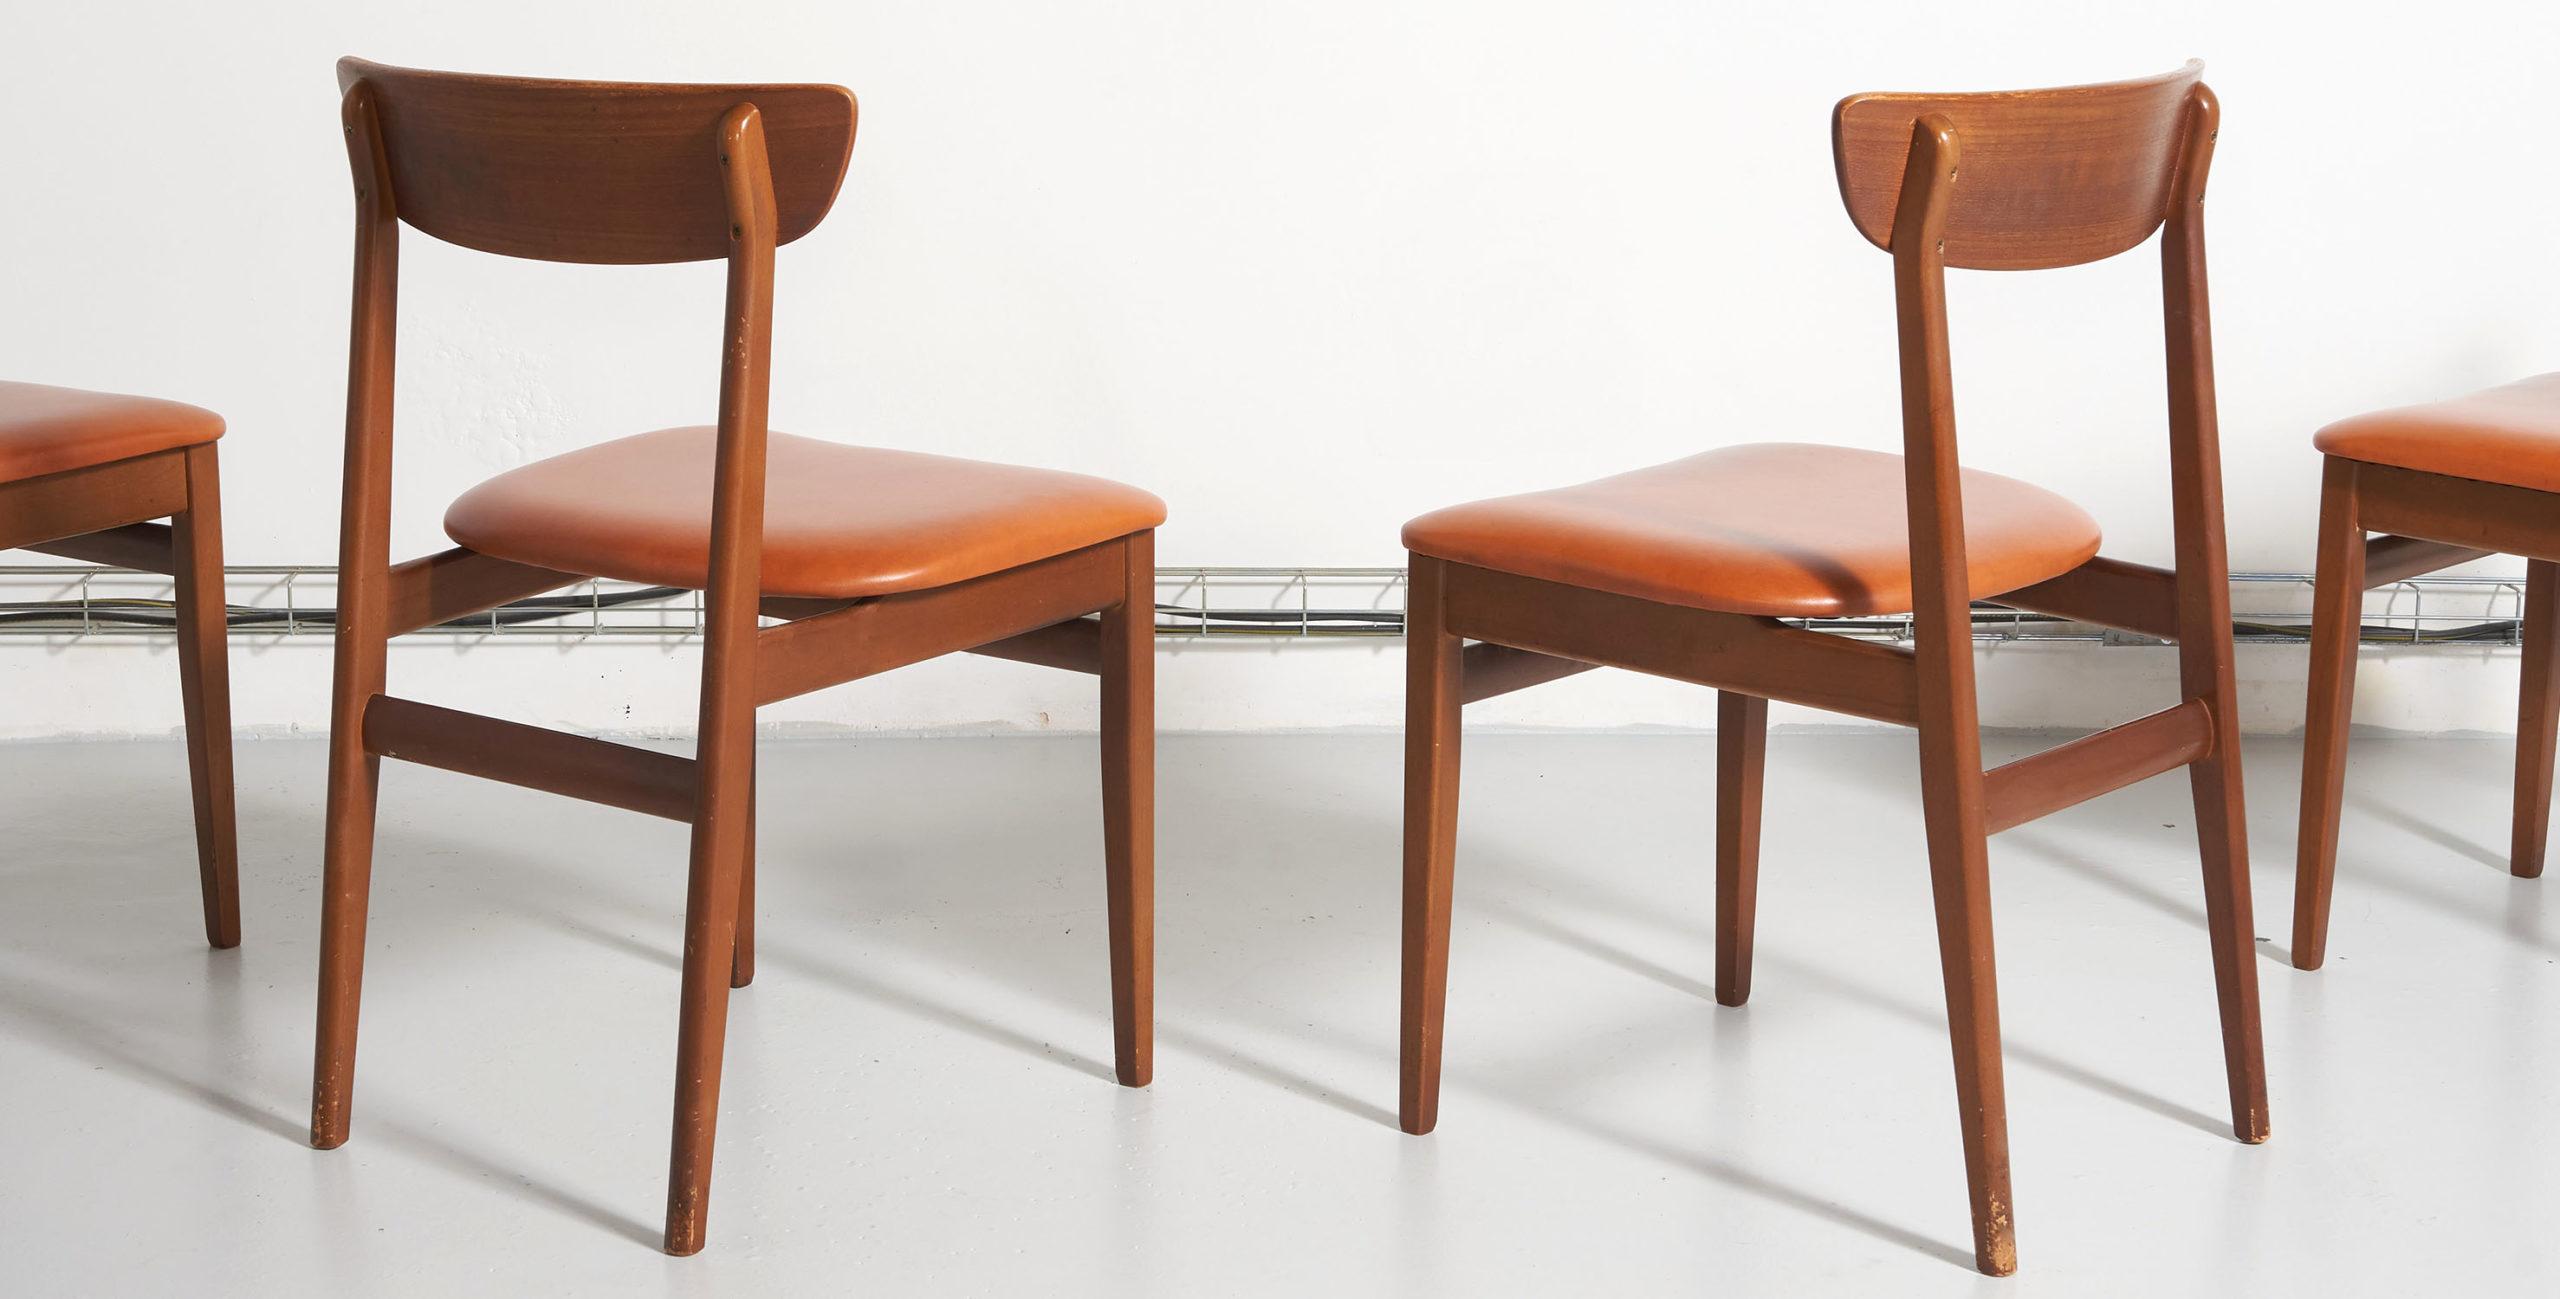 chaises vintage, chaises en teck, chaises en teck vintage, chaises scandinaves, chaises scandinaves en teck, 4 chaises vintage, 4 chaises scandinaves